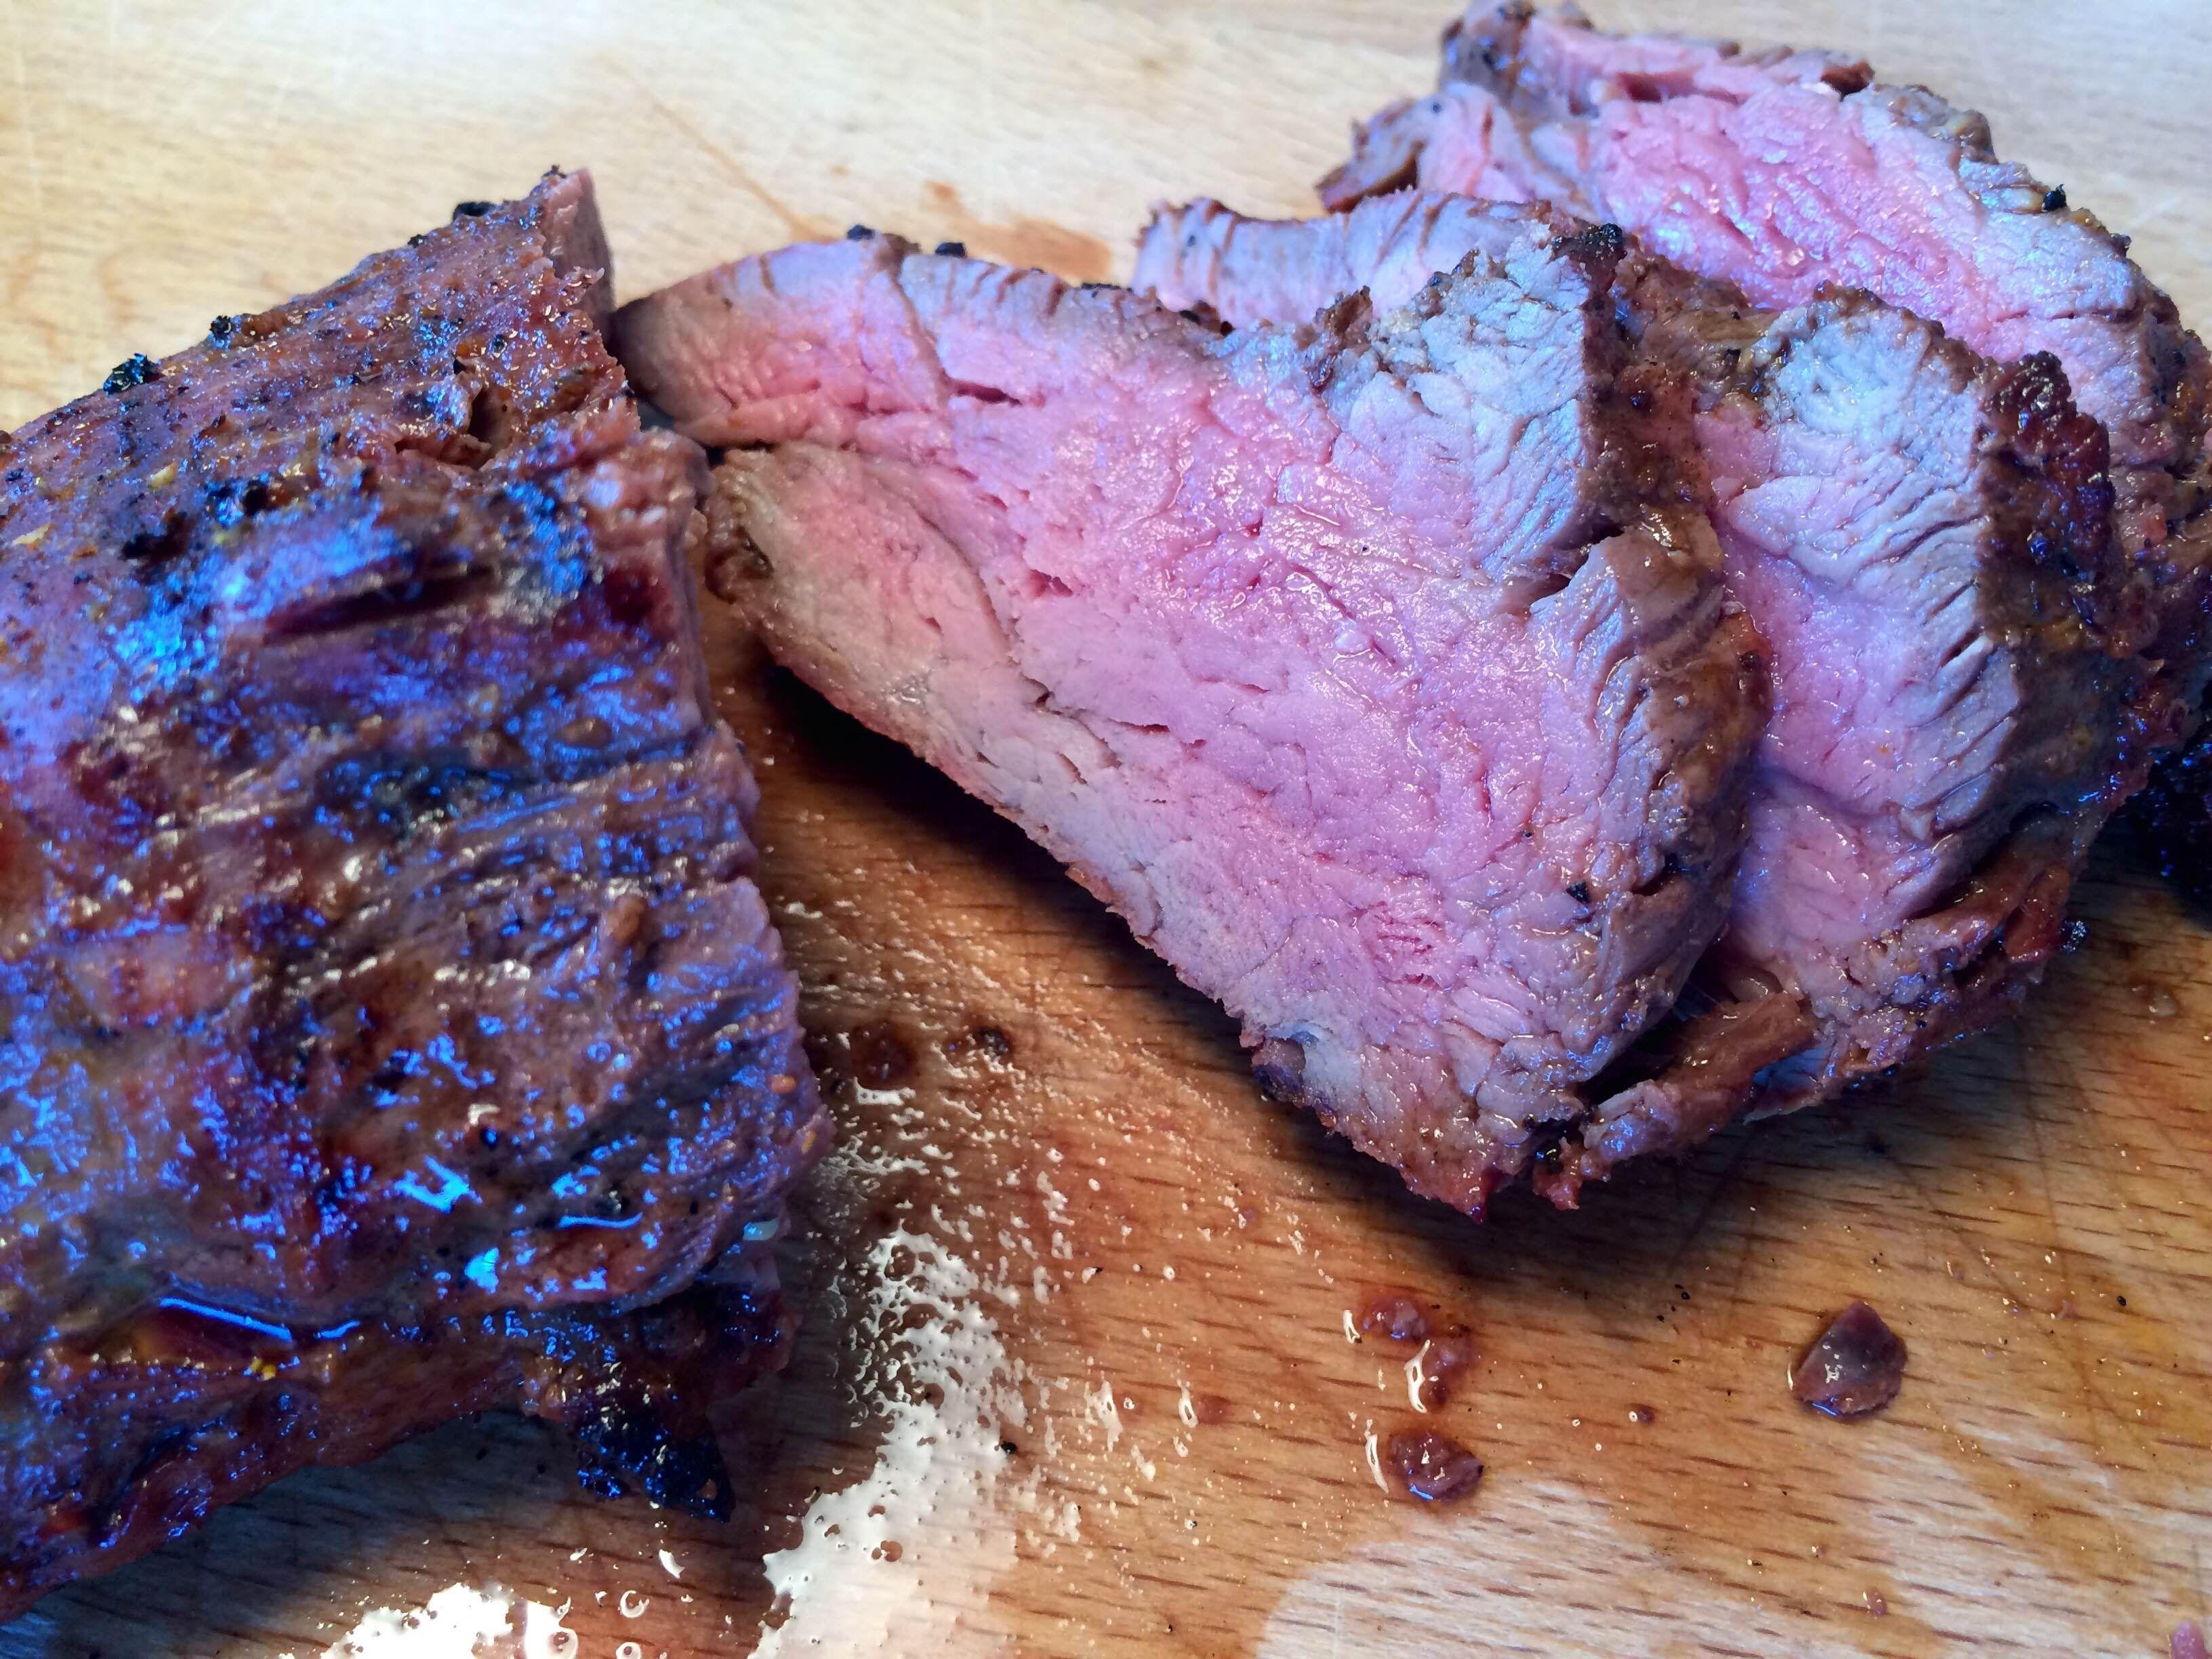 Spareribs Stegetid Gasgrill : Chateaubriand oksemørbrad på grill med stegetid oksekød kalv